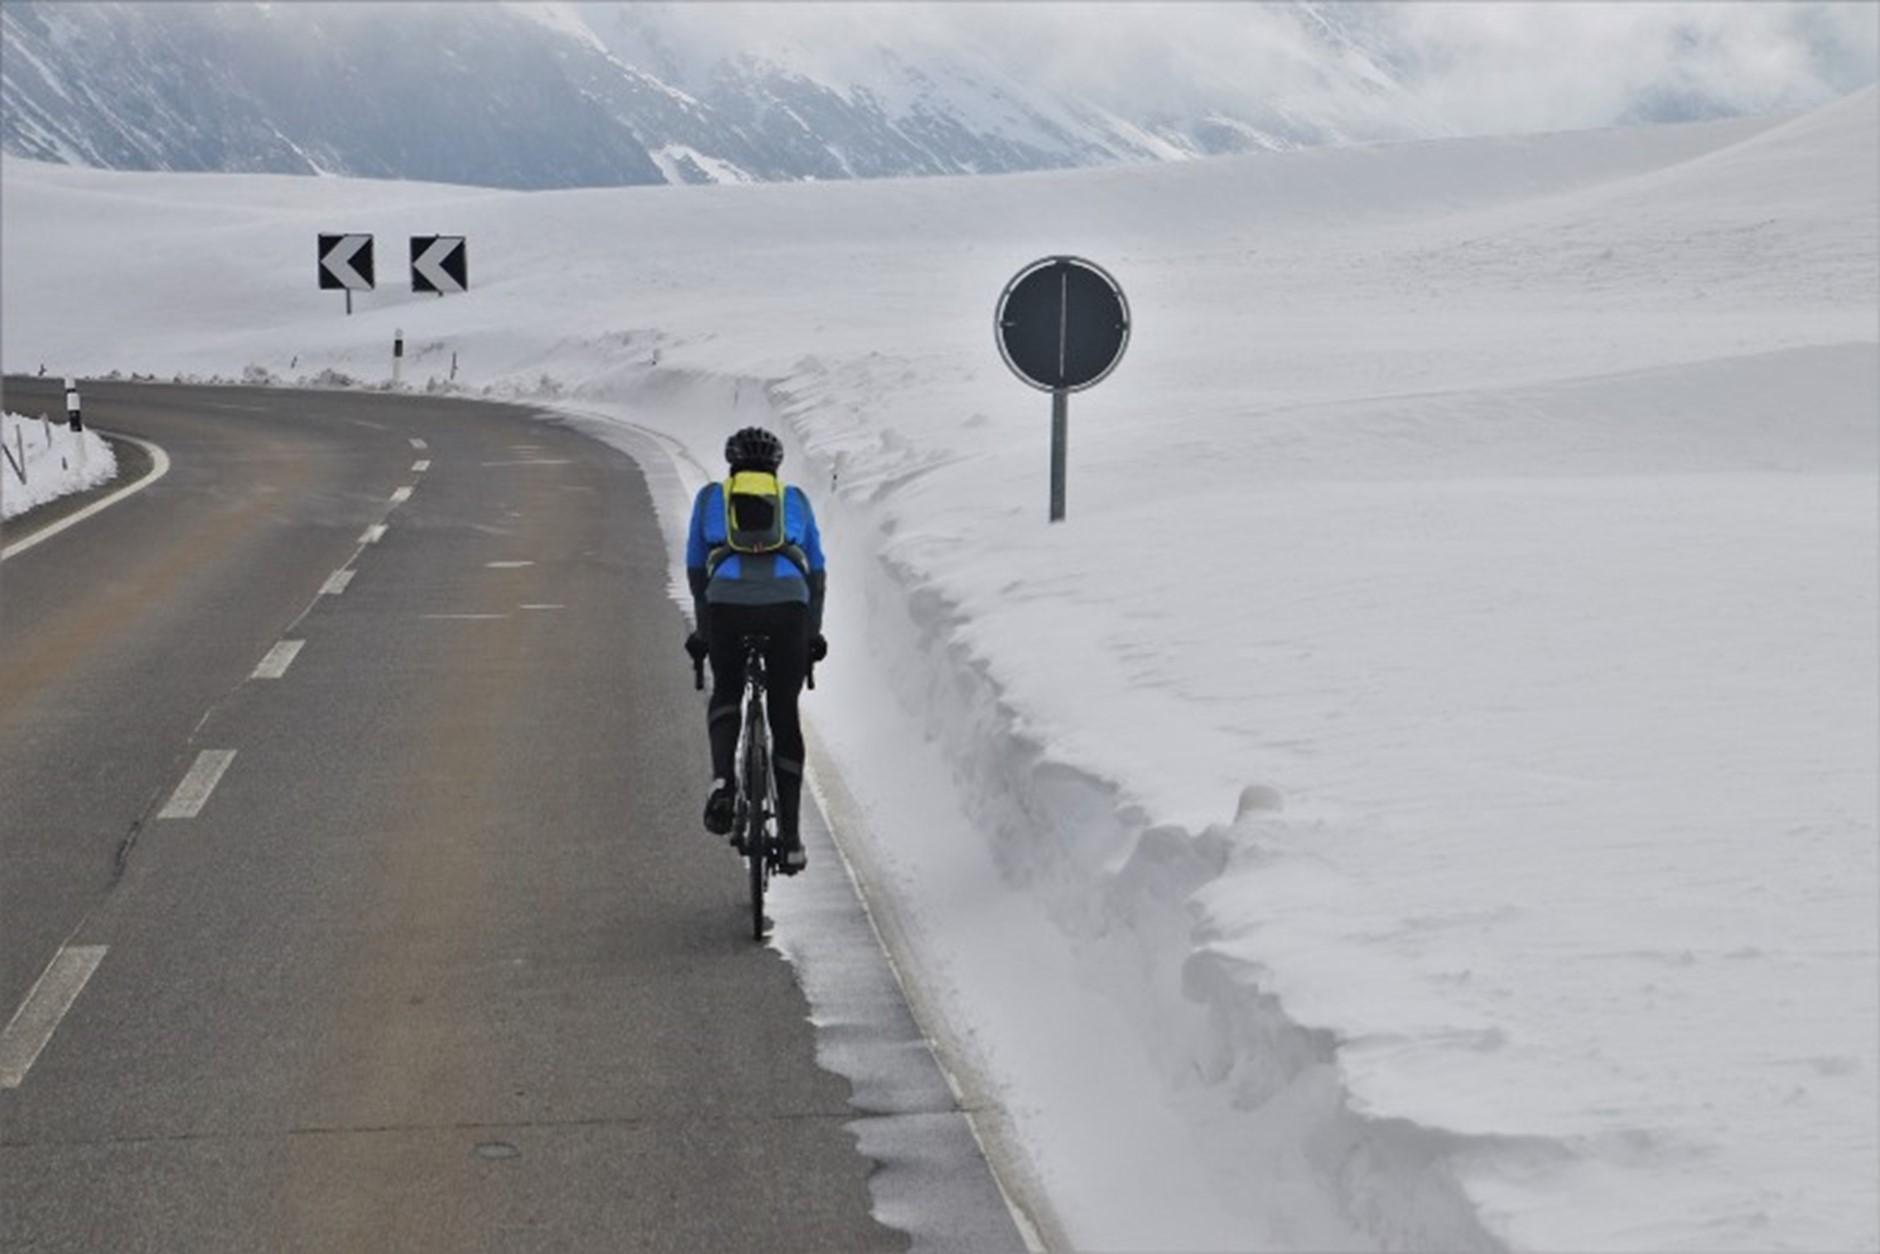 Bike Path bicyclist in winter snow roadway